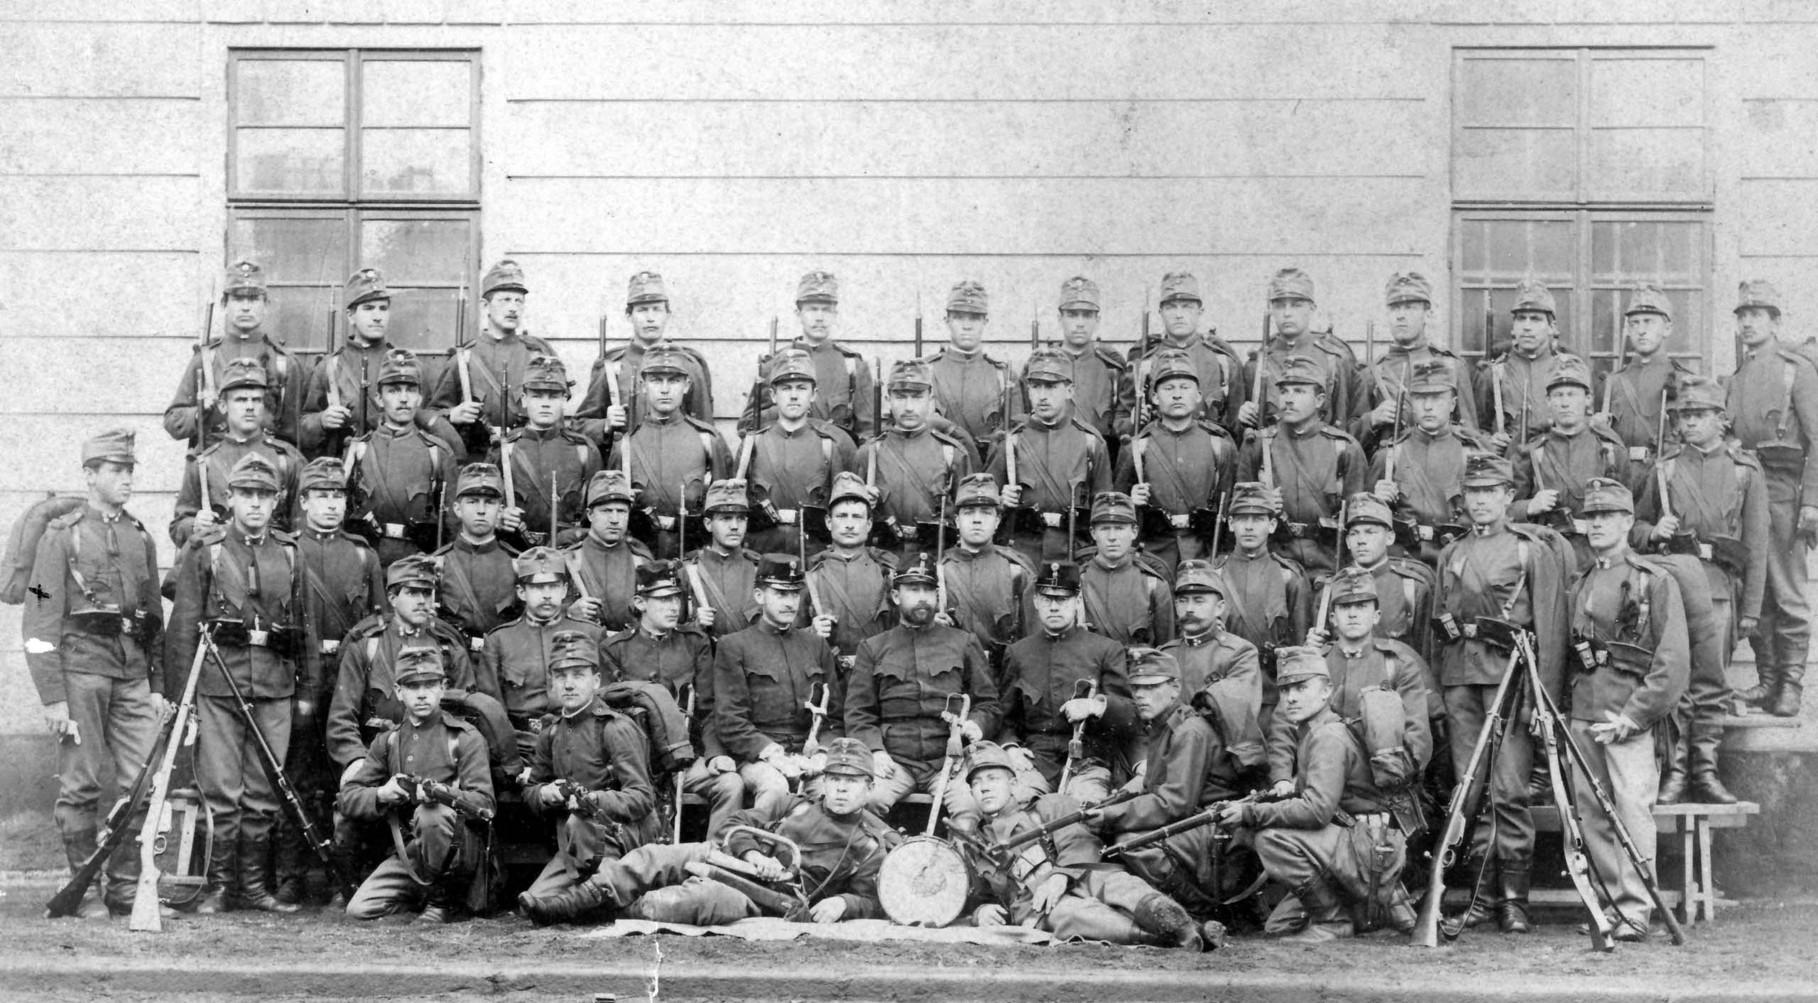 Ganz links: Corporal Johann Karl Stübiger, 16. Feldkompanie, K.u.K.-Infanterie-Regiment Wilhelm Herzog von Württemberg No. 23, im April 1892